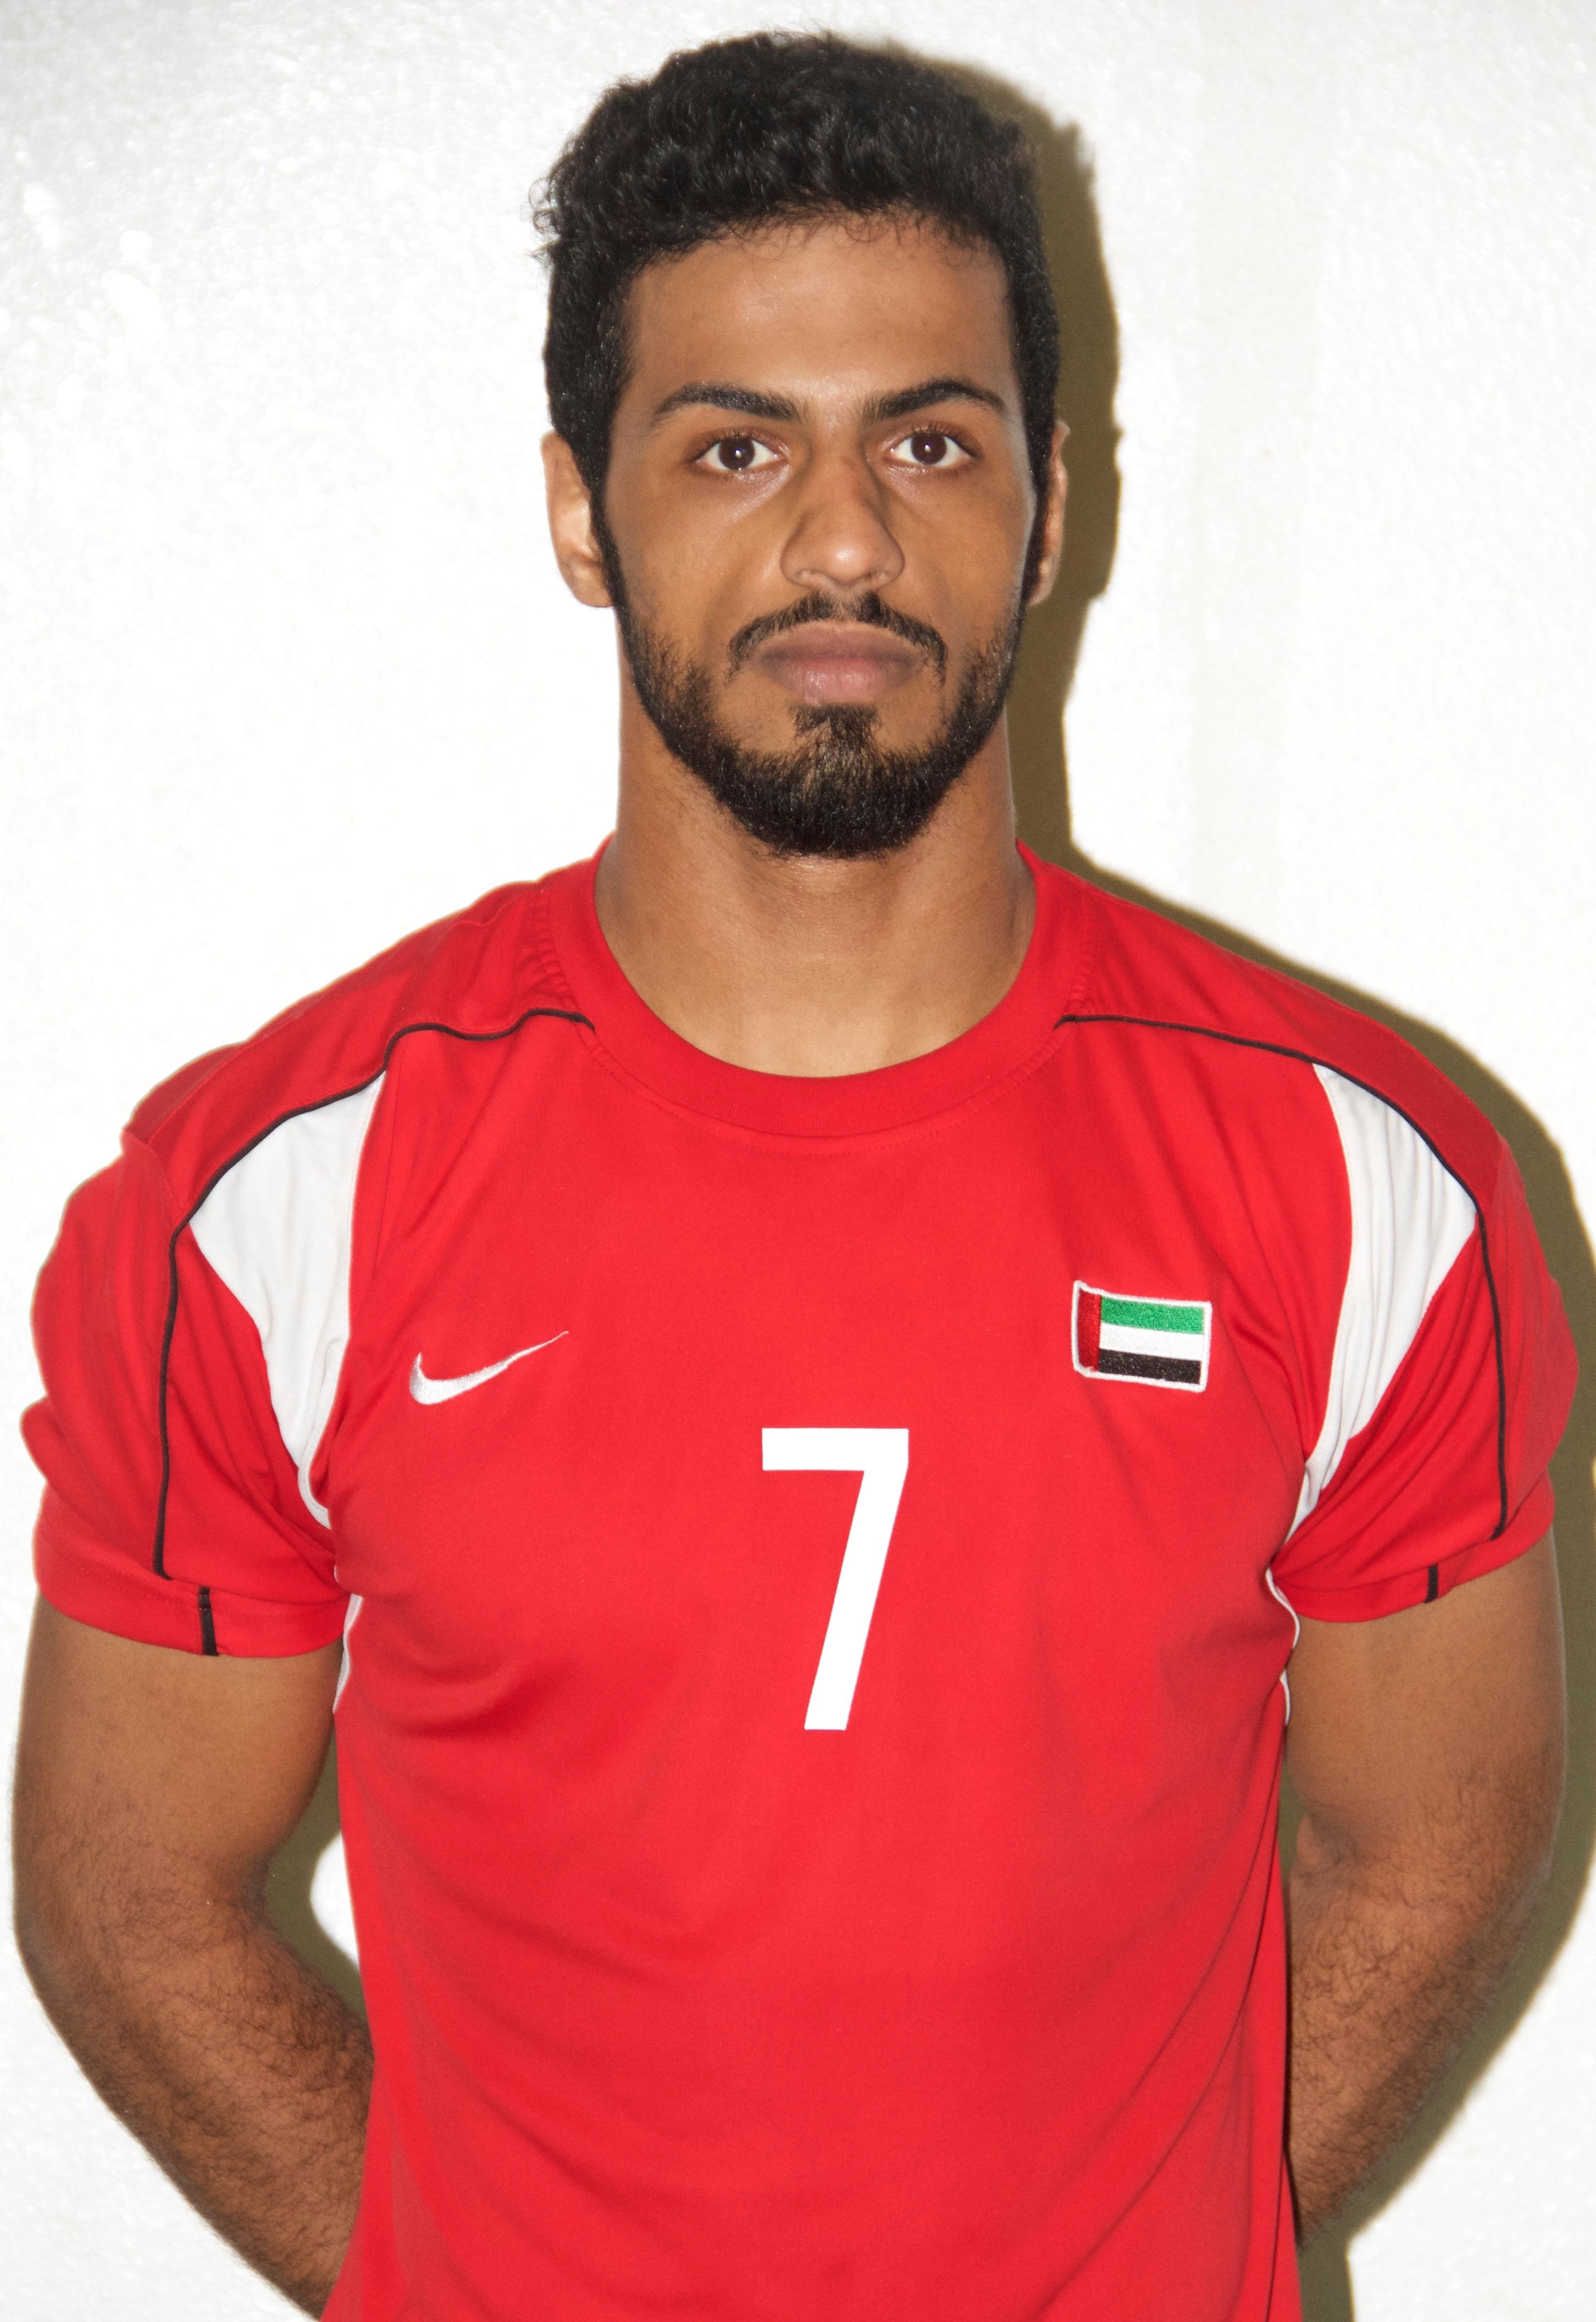 Mohammed Khamis Alsuwaidi